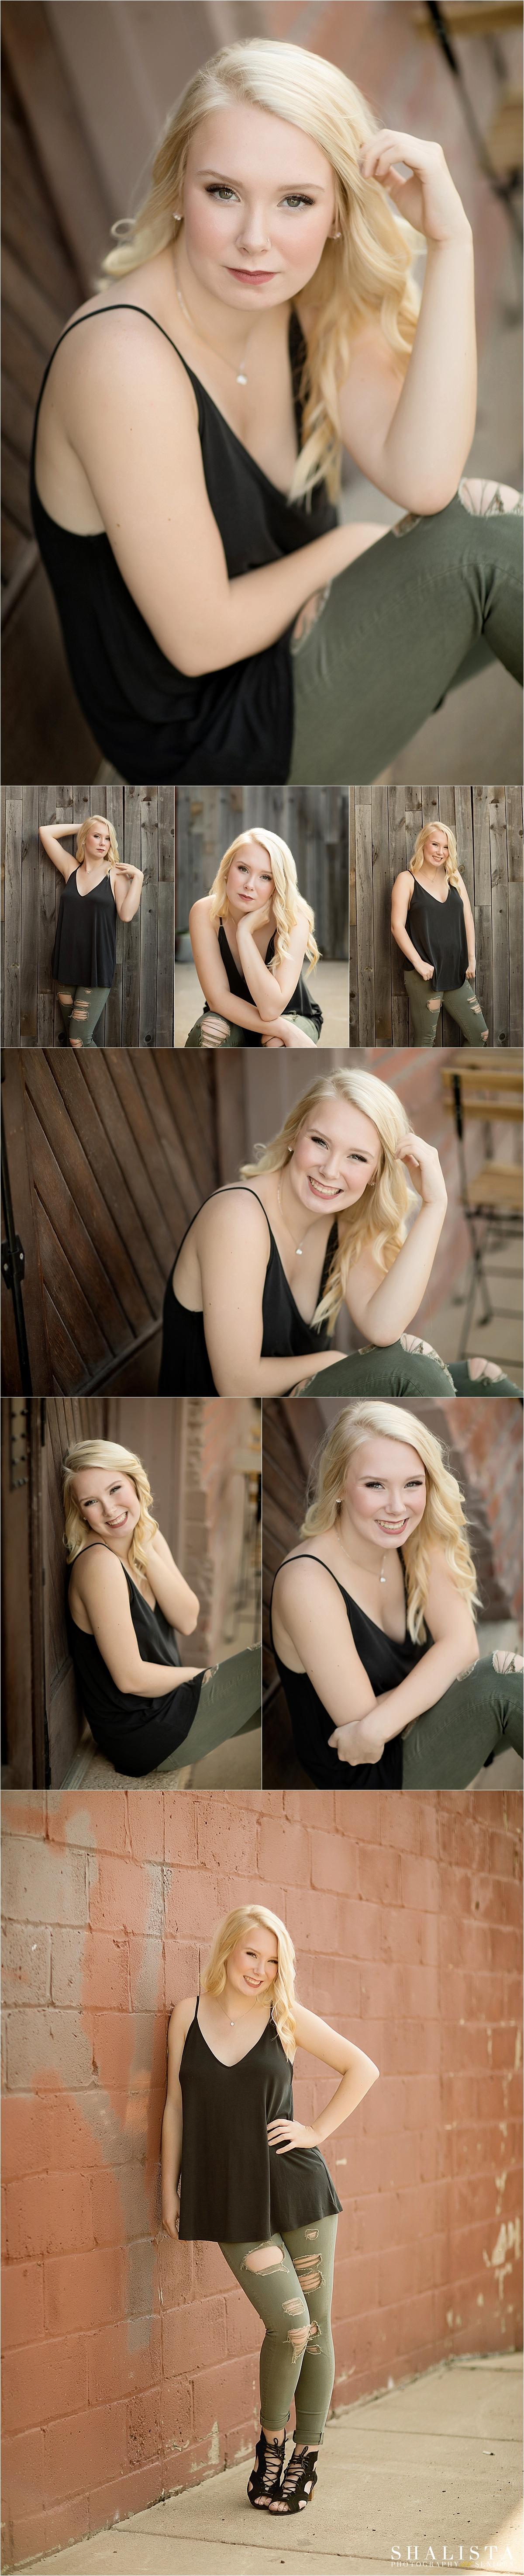 Senior Photos at Breadico